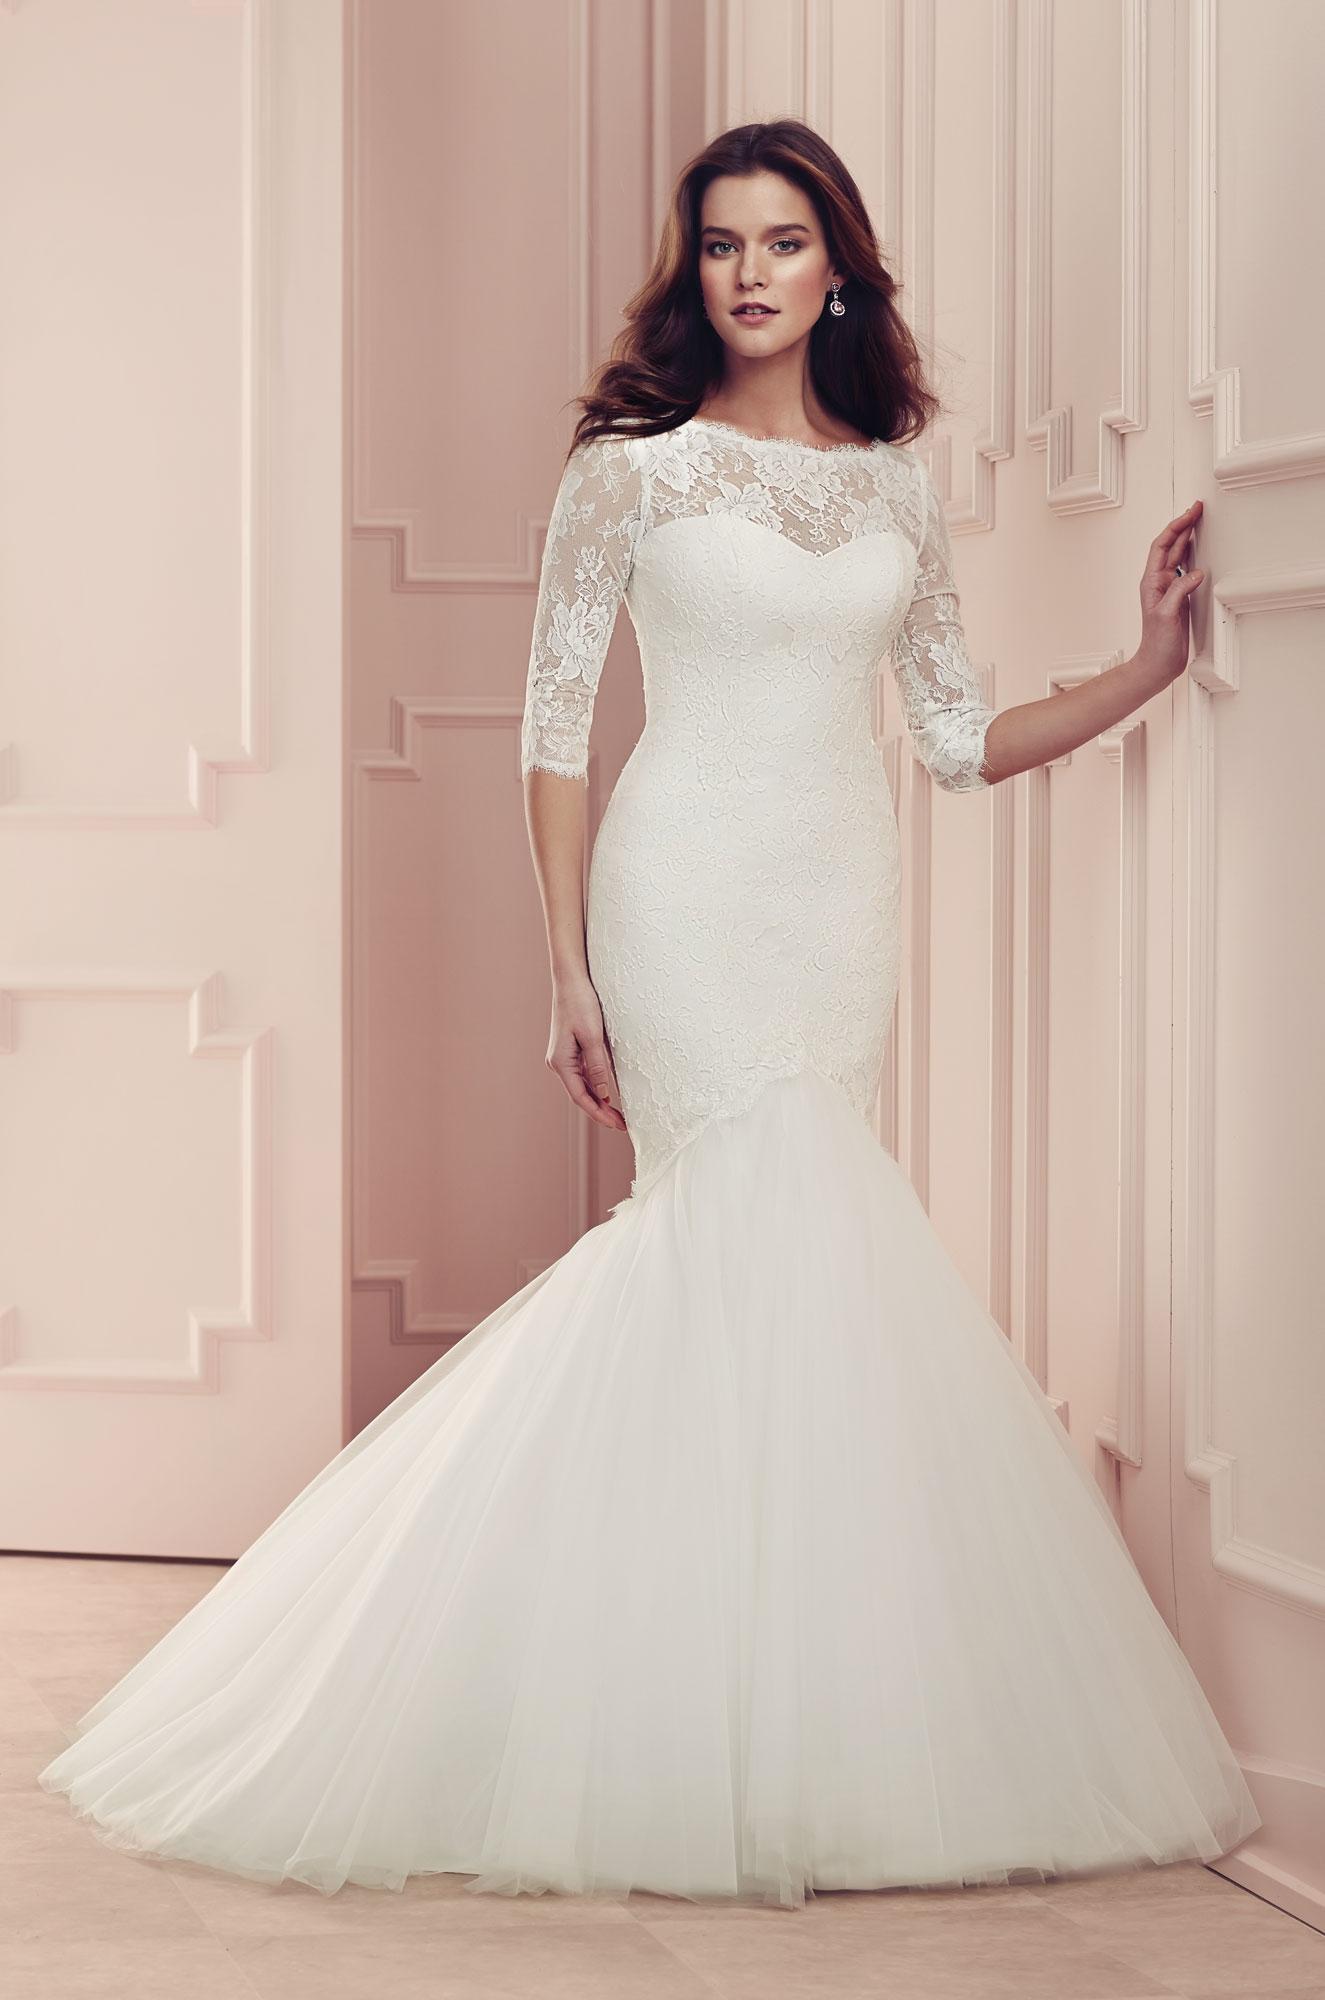 paloma blanca wedding dresses photo - 1